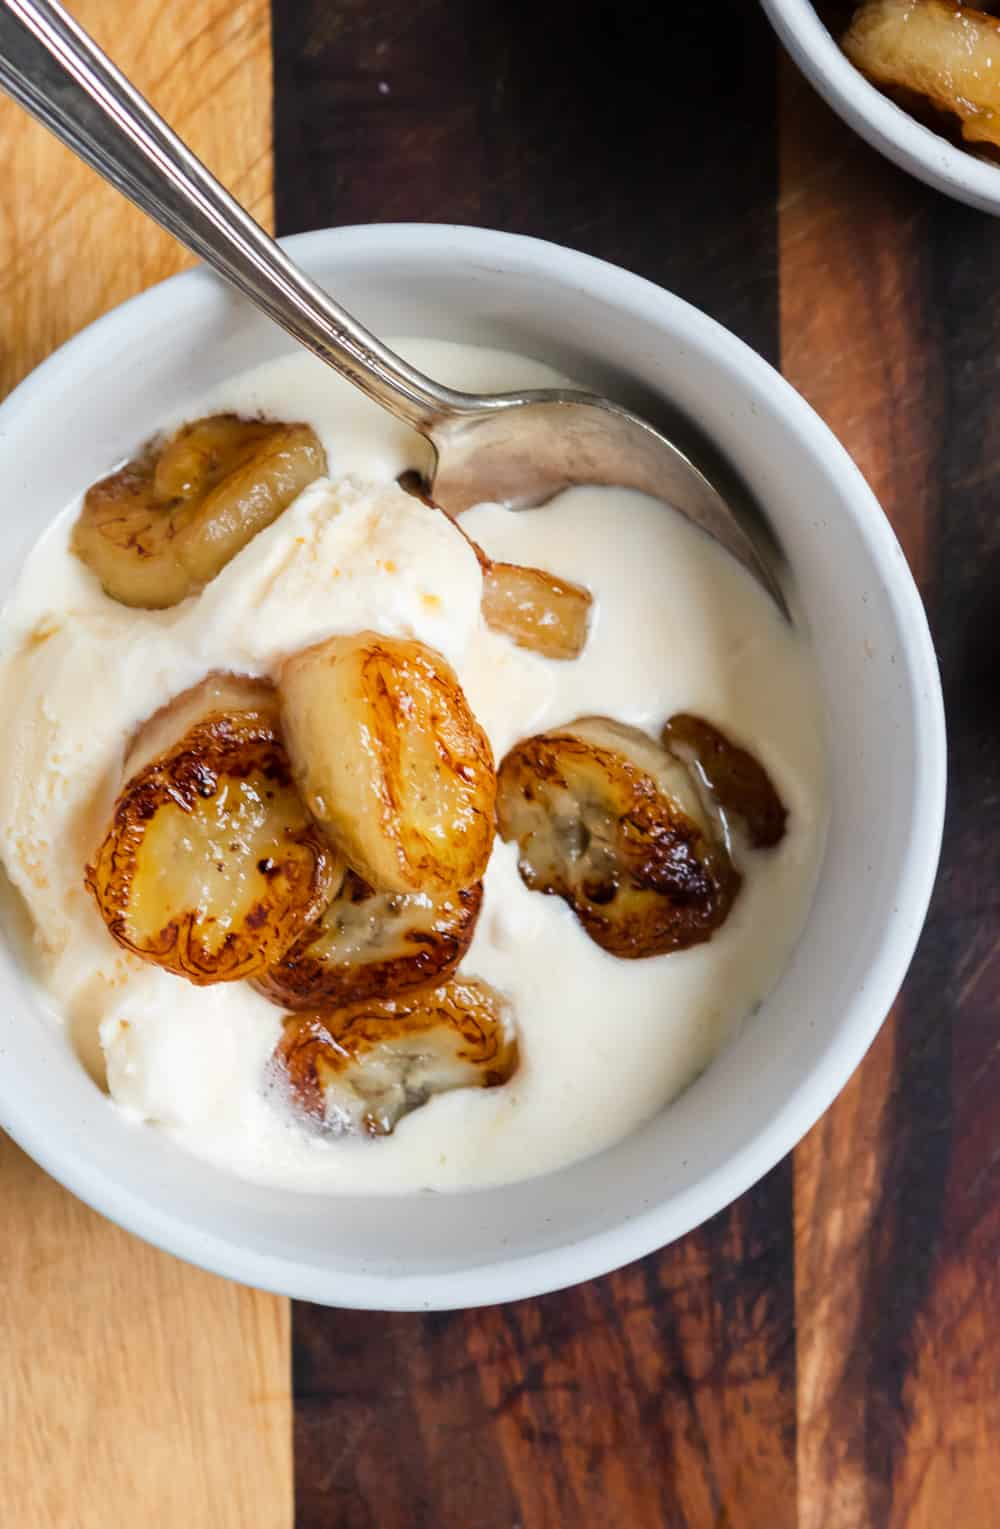 Maple Fried Bananas over ice cream.